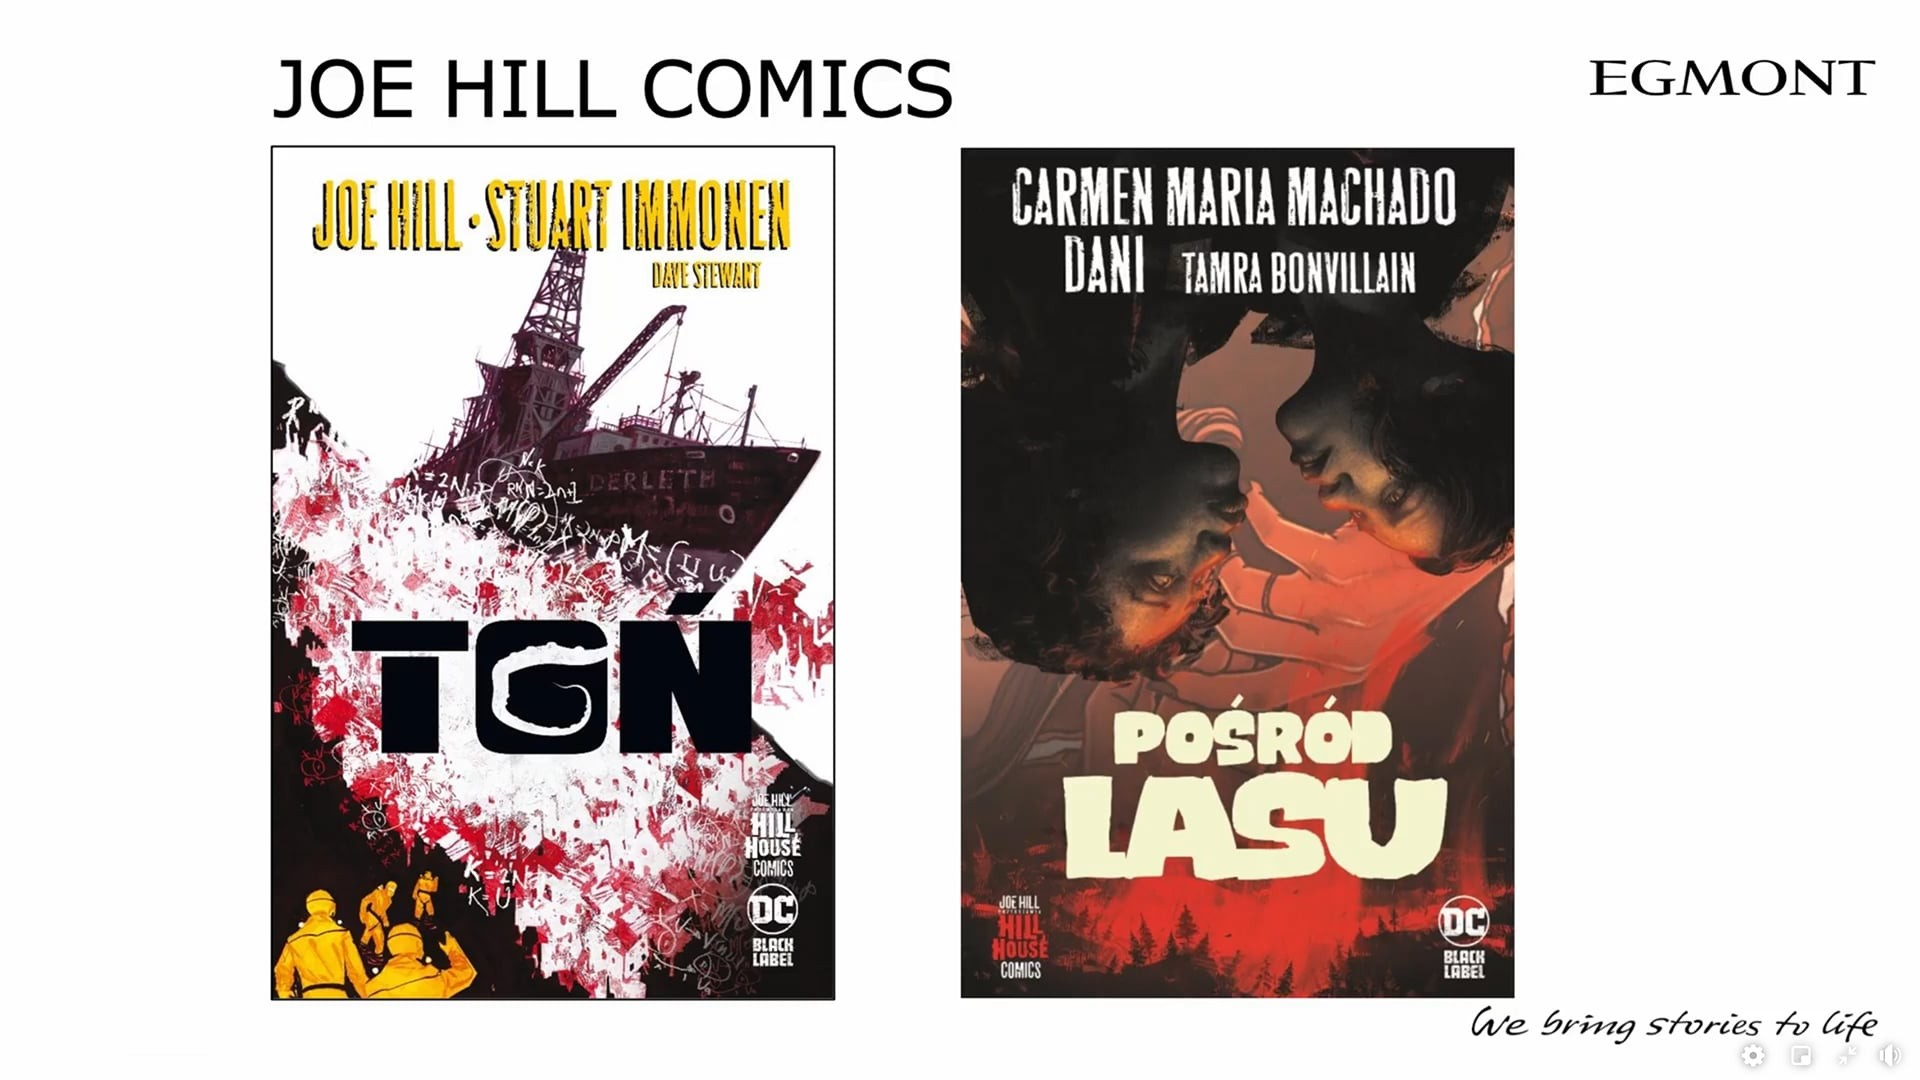 Joe Hill Comics komiksy Egmontu na 2021